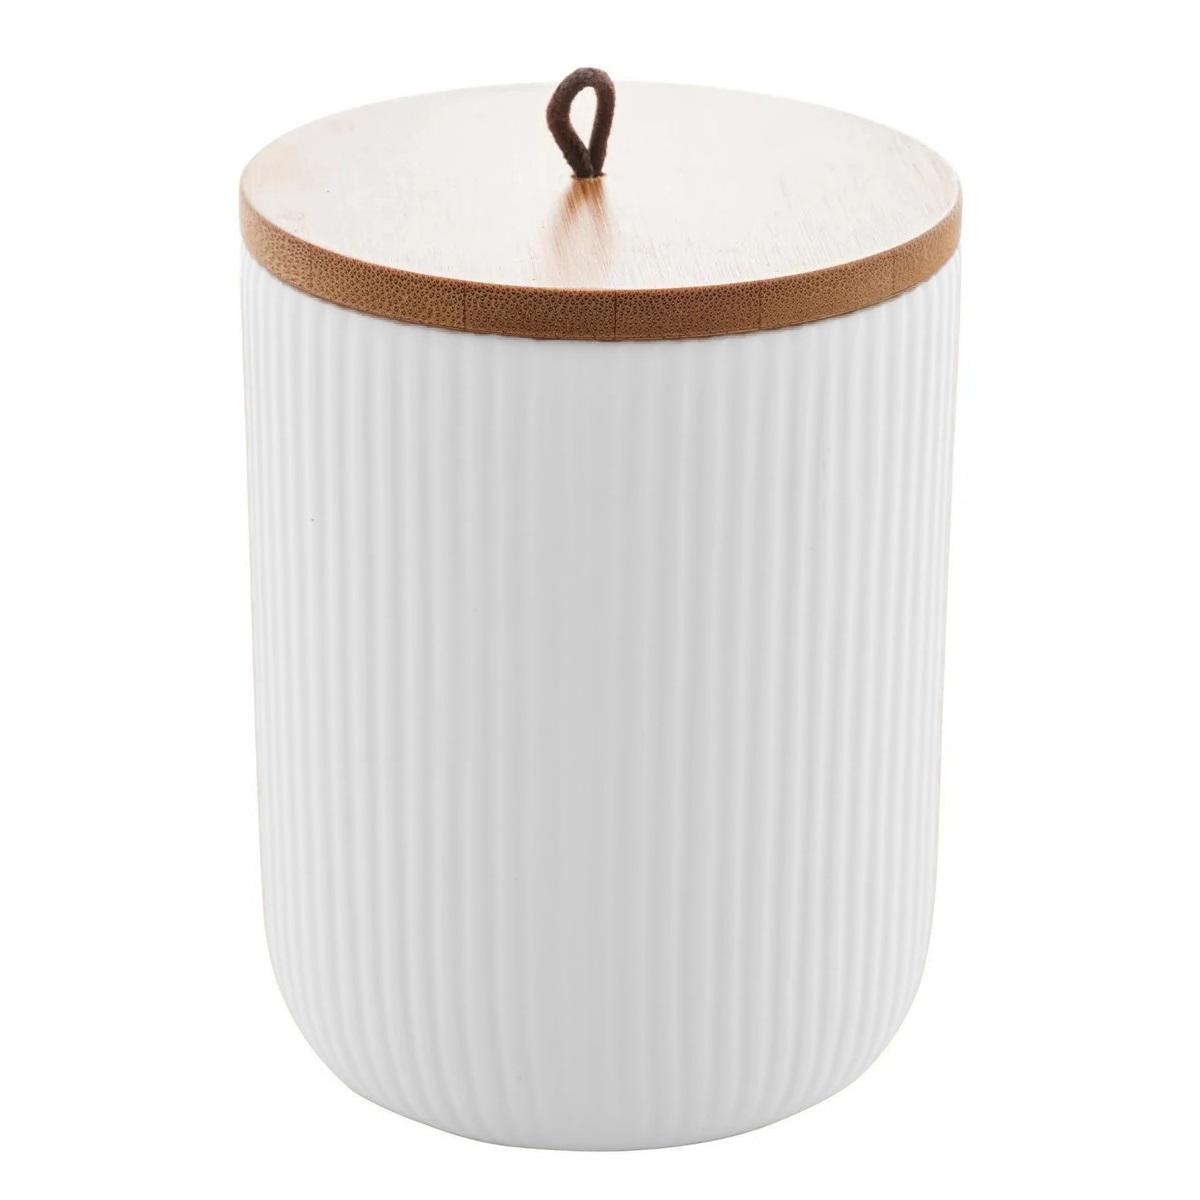 Pote hermético de cerâmica com tampa de bambu Lines Lyor 12,5 cm